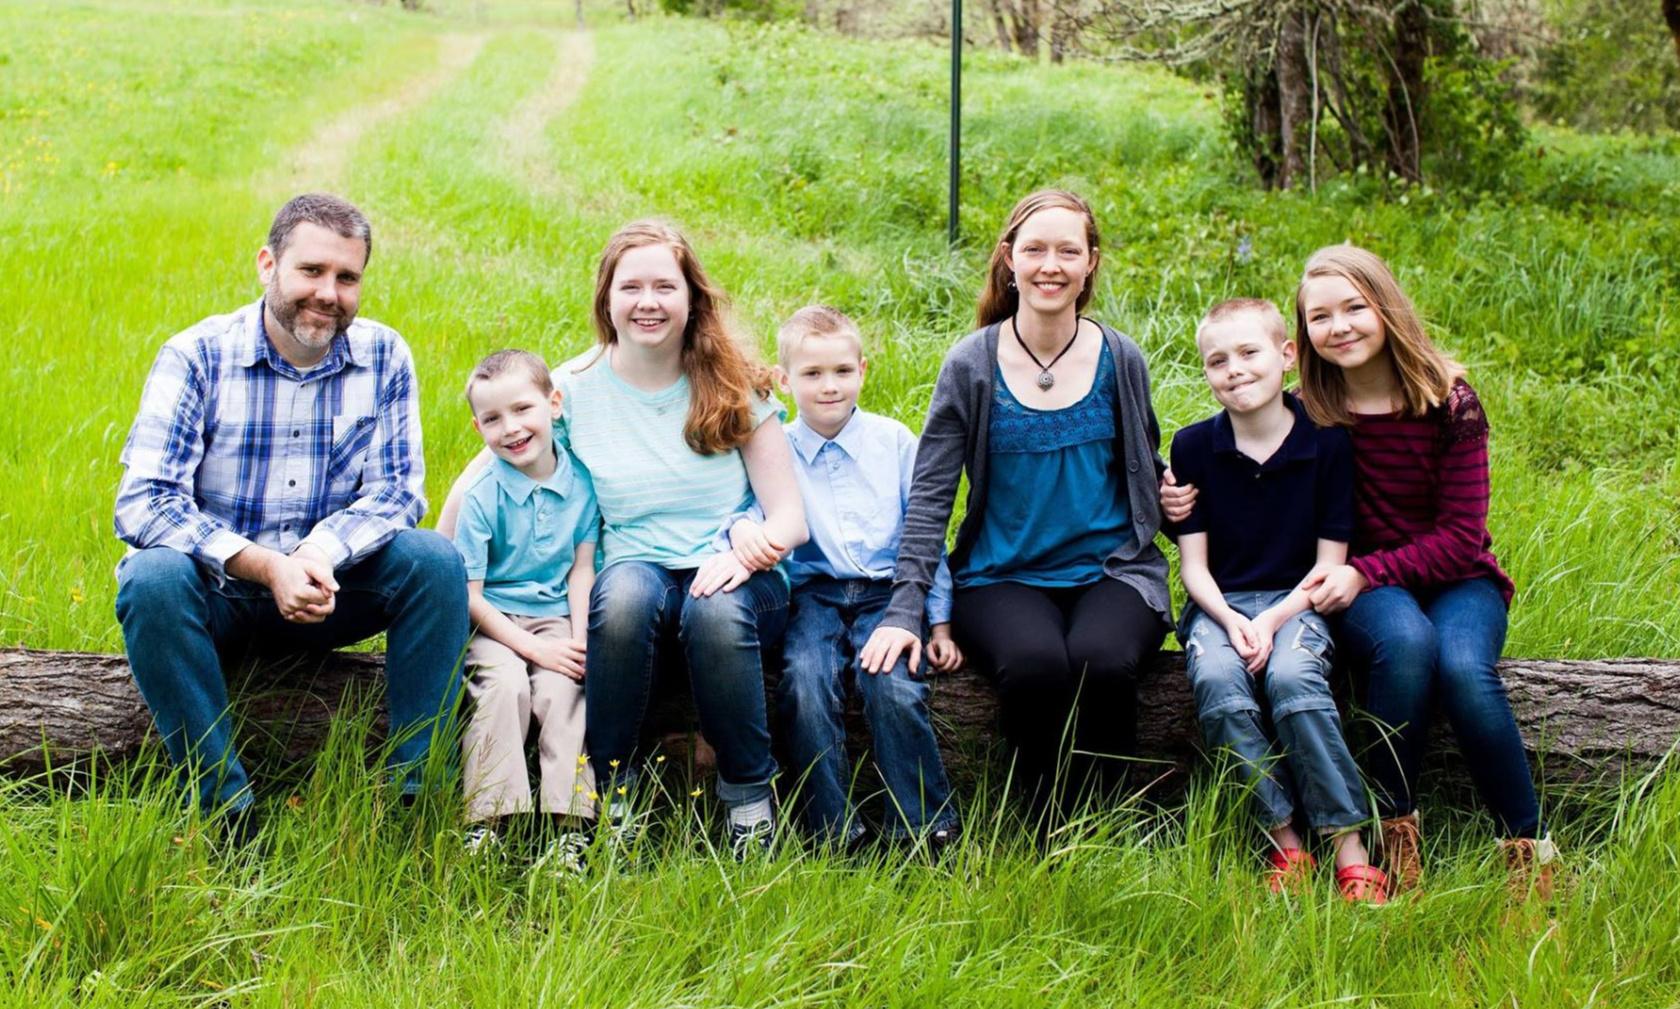 Jason Hague: Aching Joy